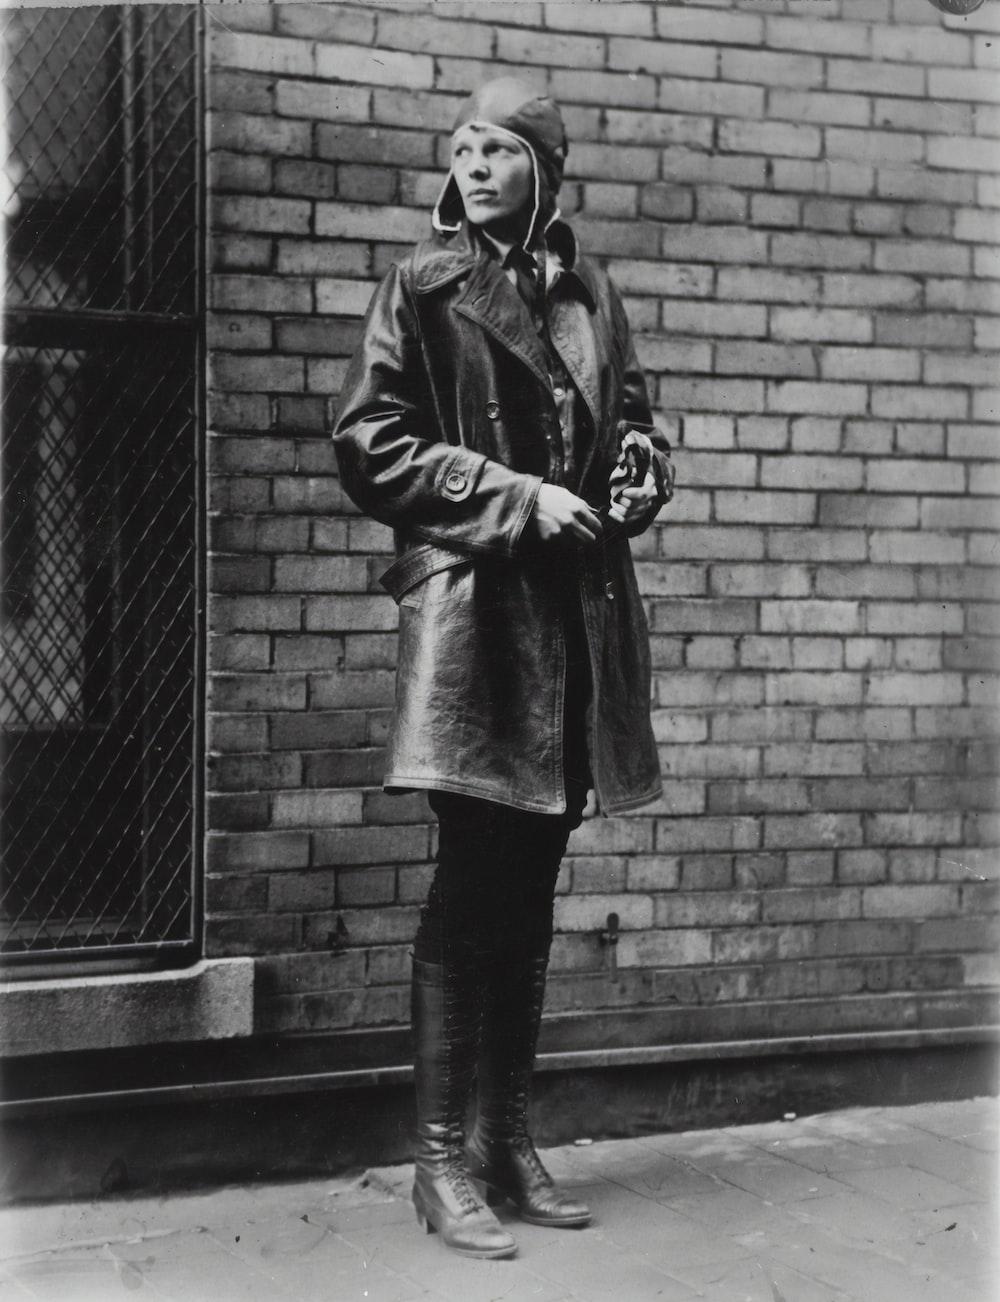 woman in coat standing beside brick wall